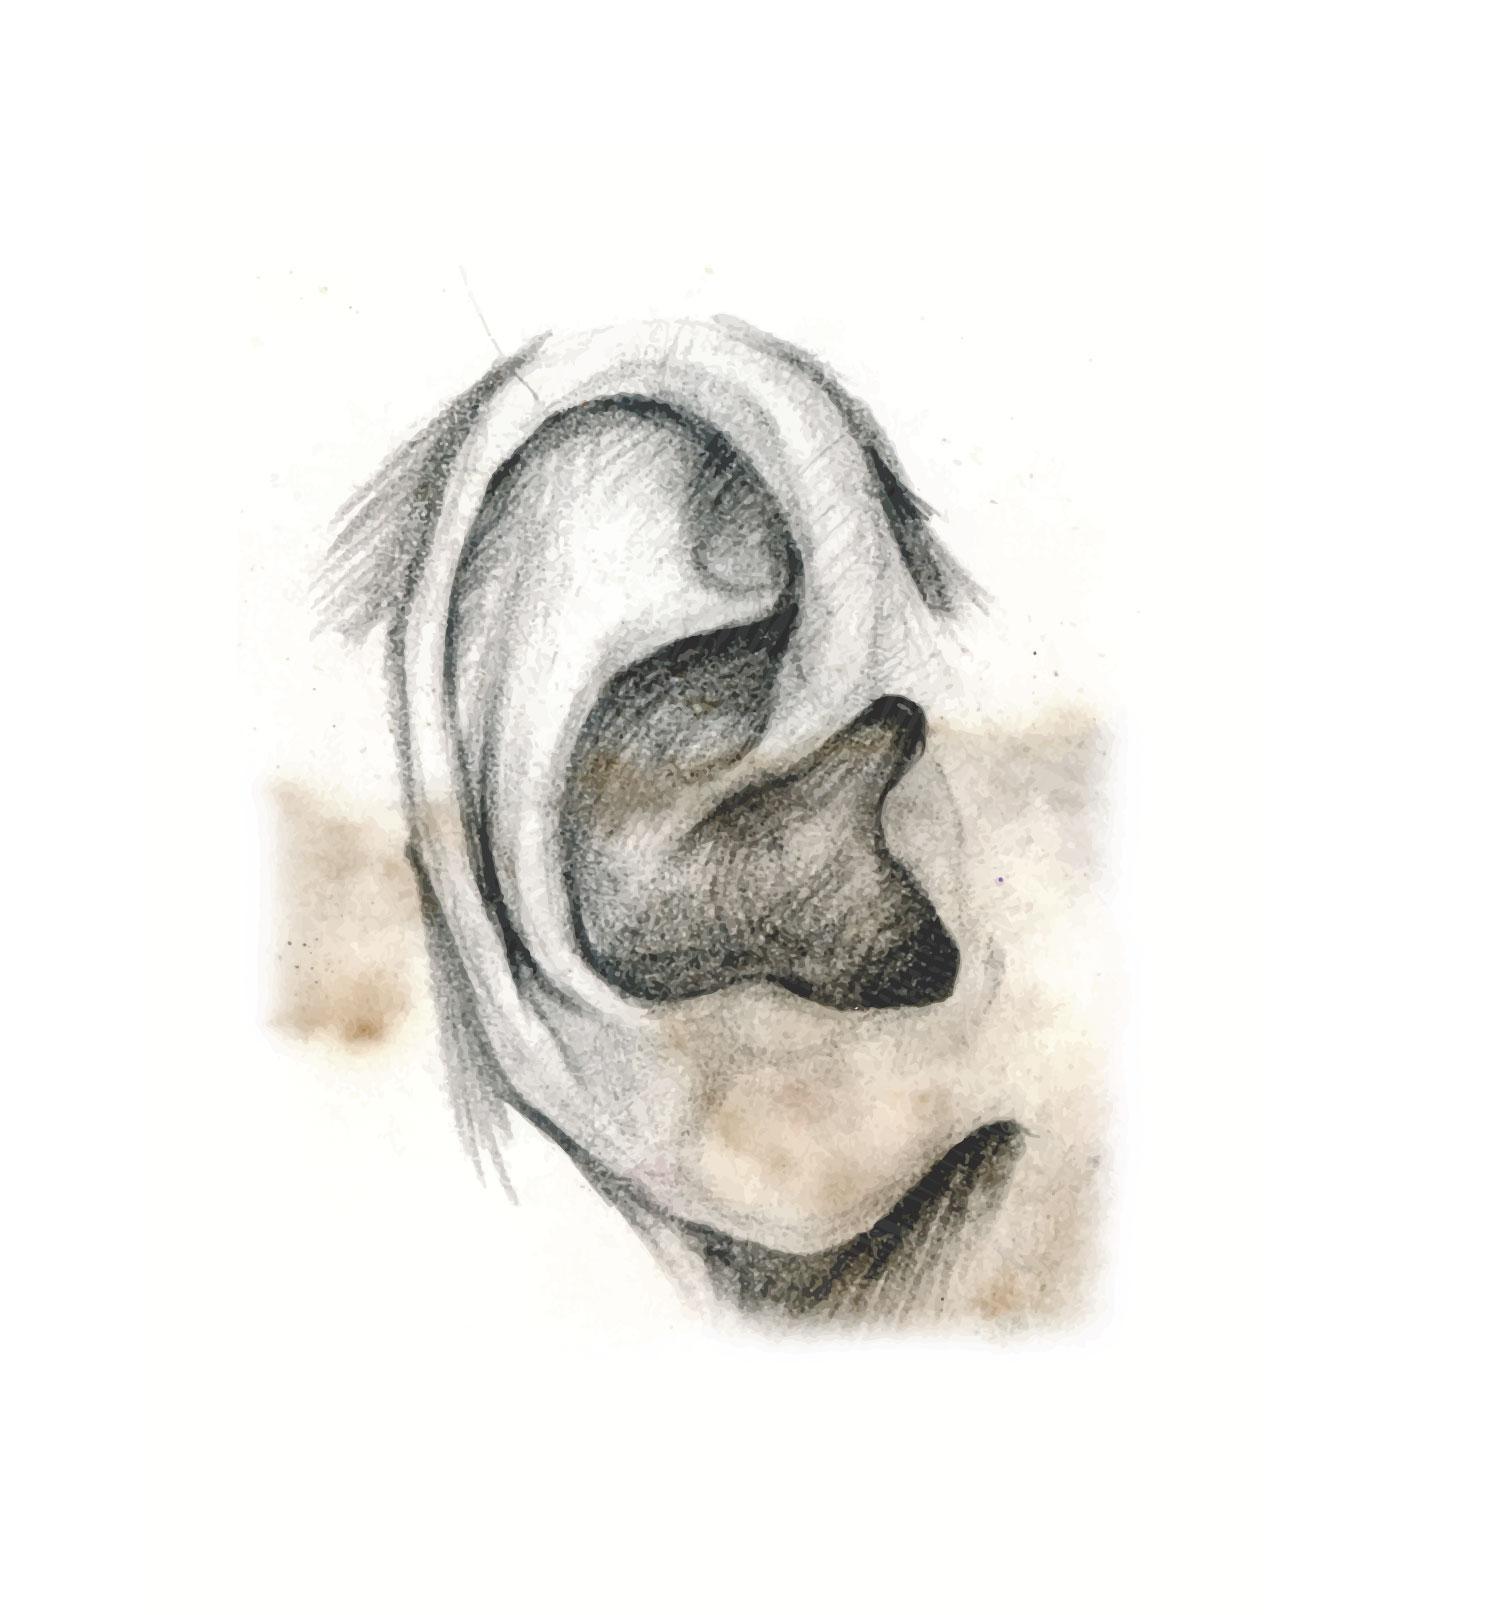 ear-sketch.jpg